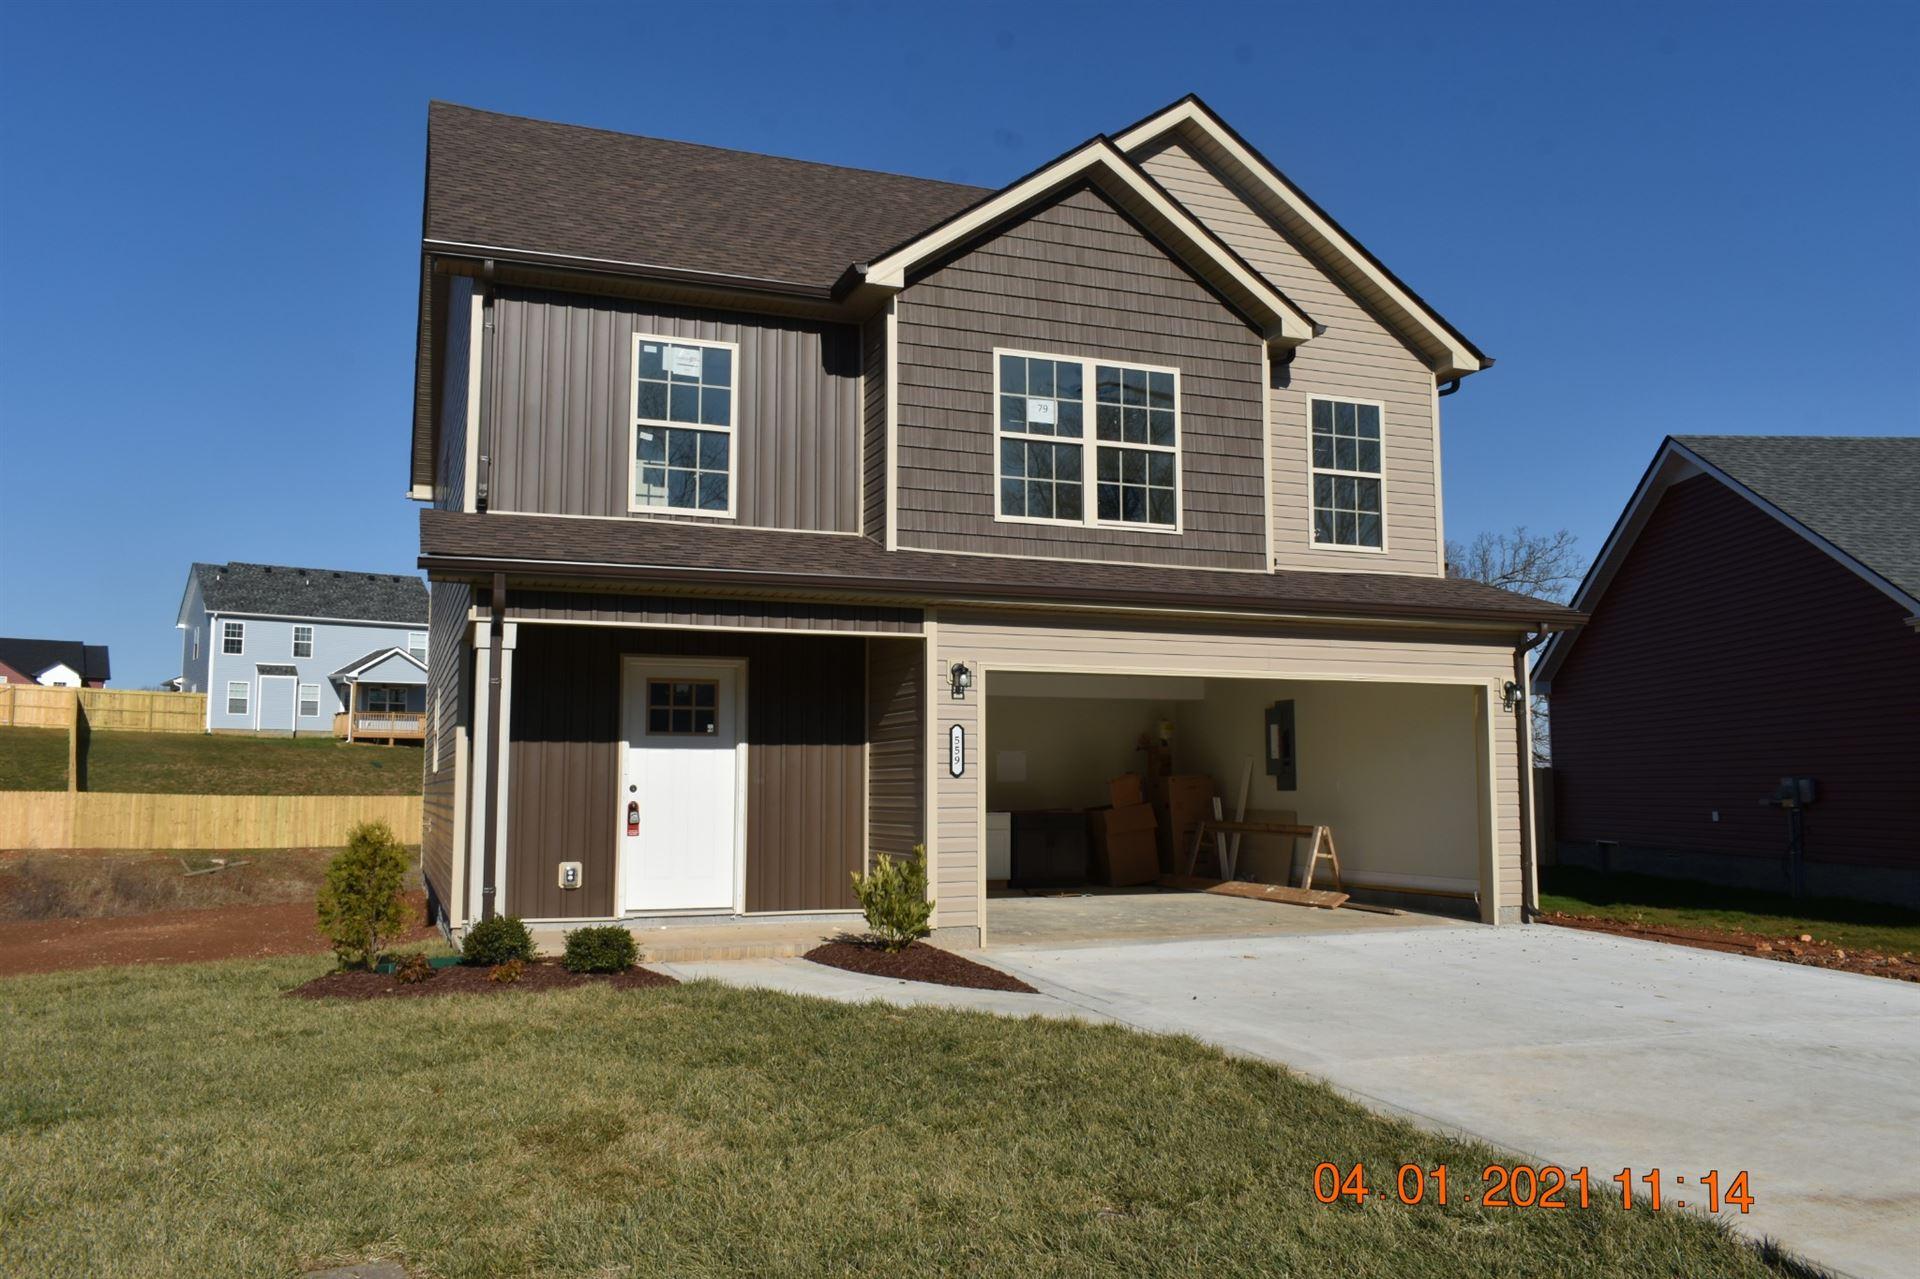 79 Chestnut Hill, Clarksville, TN 37042 - MLS#: 2184805